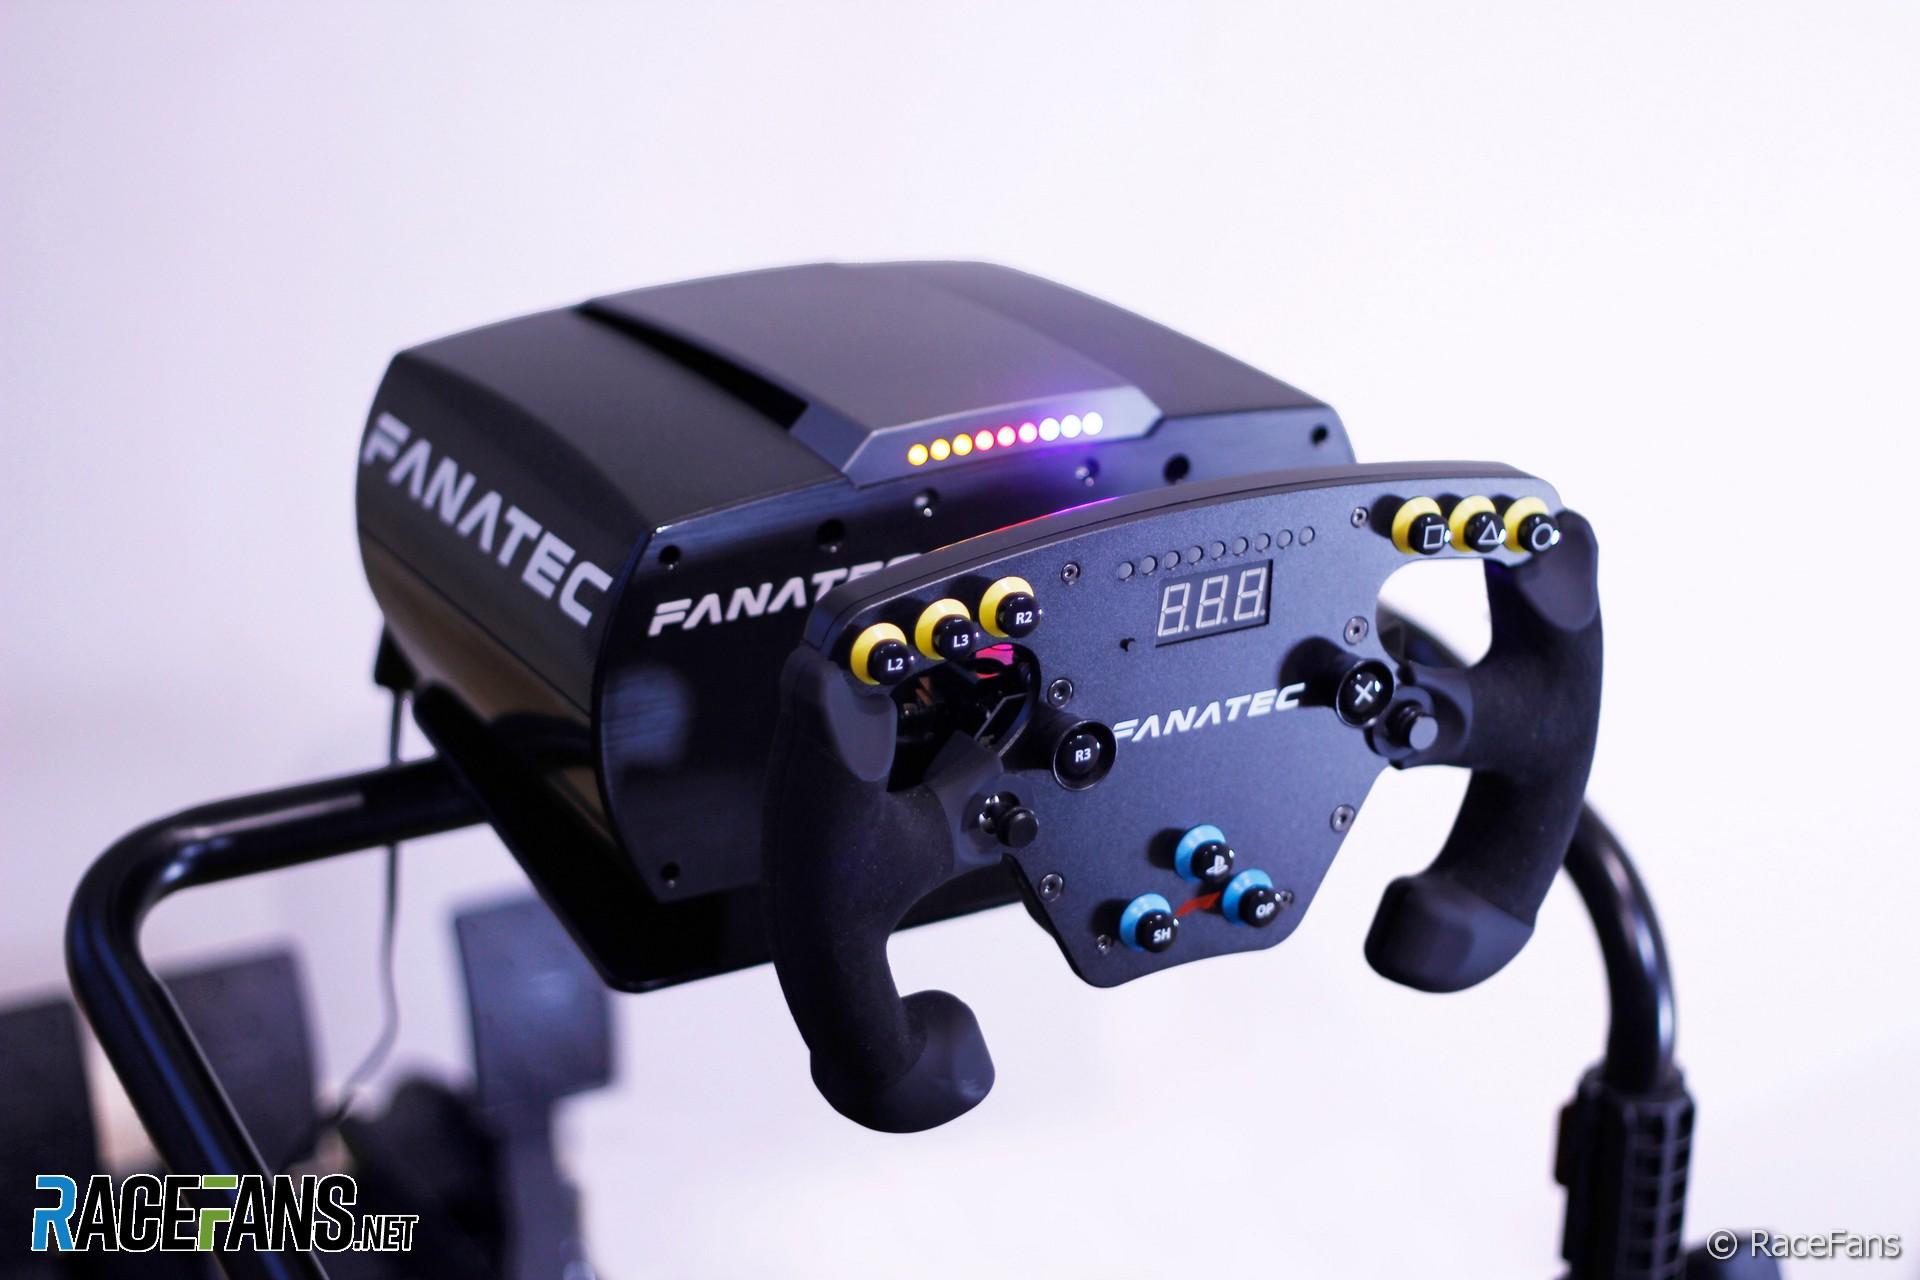 Fanatec CSL Elite F1 simracing kit and load cell brake pedal